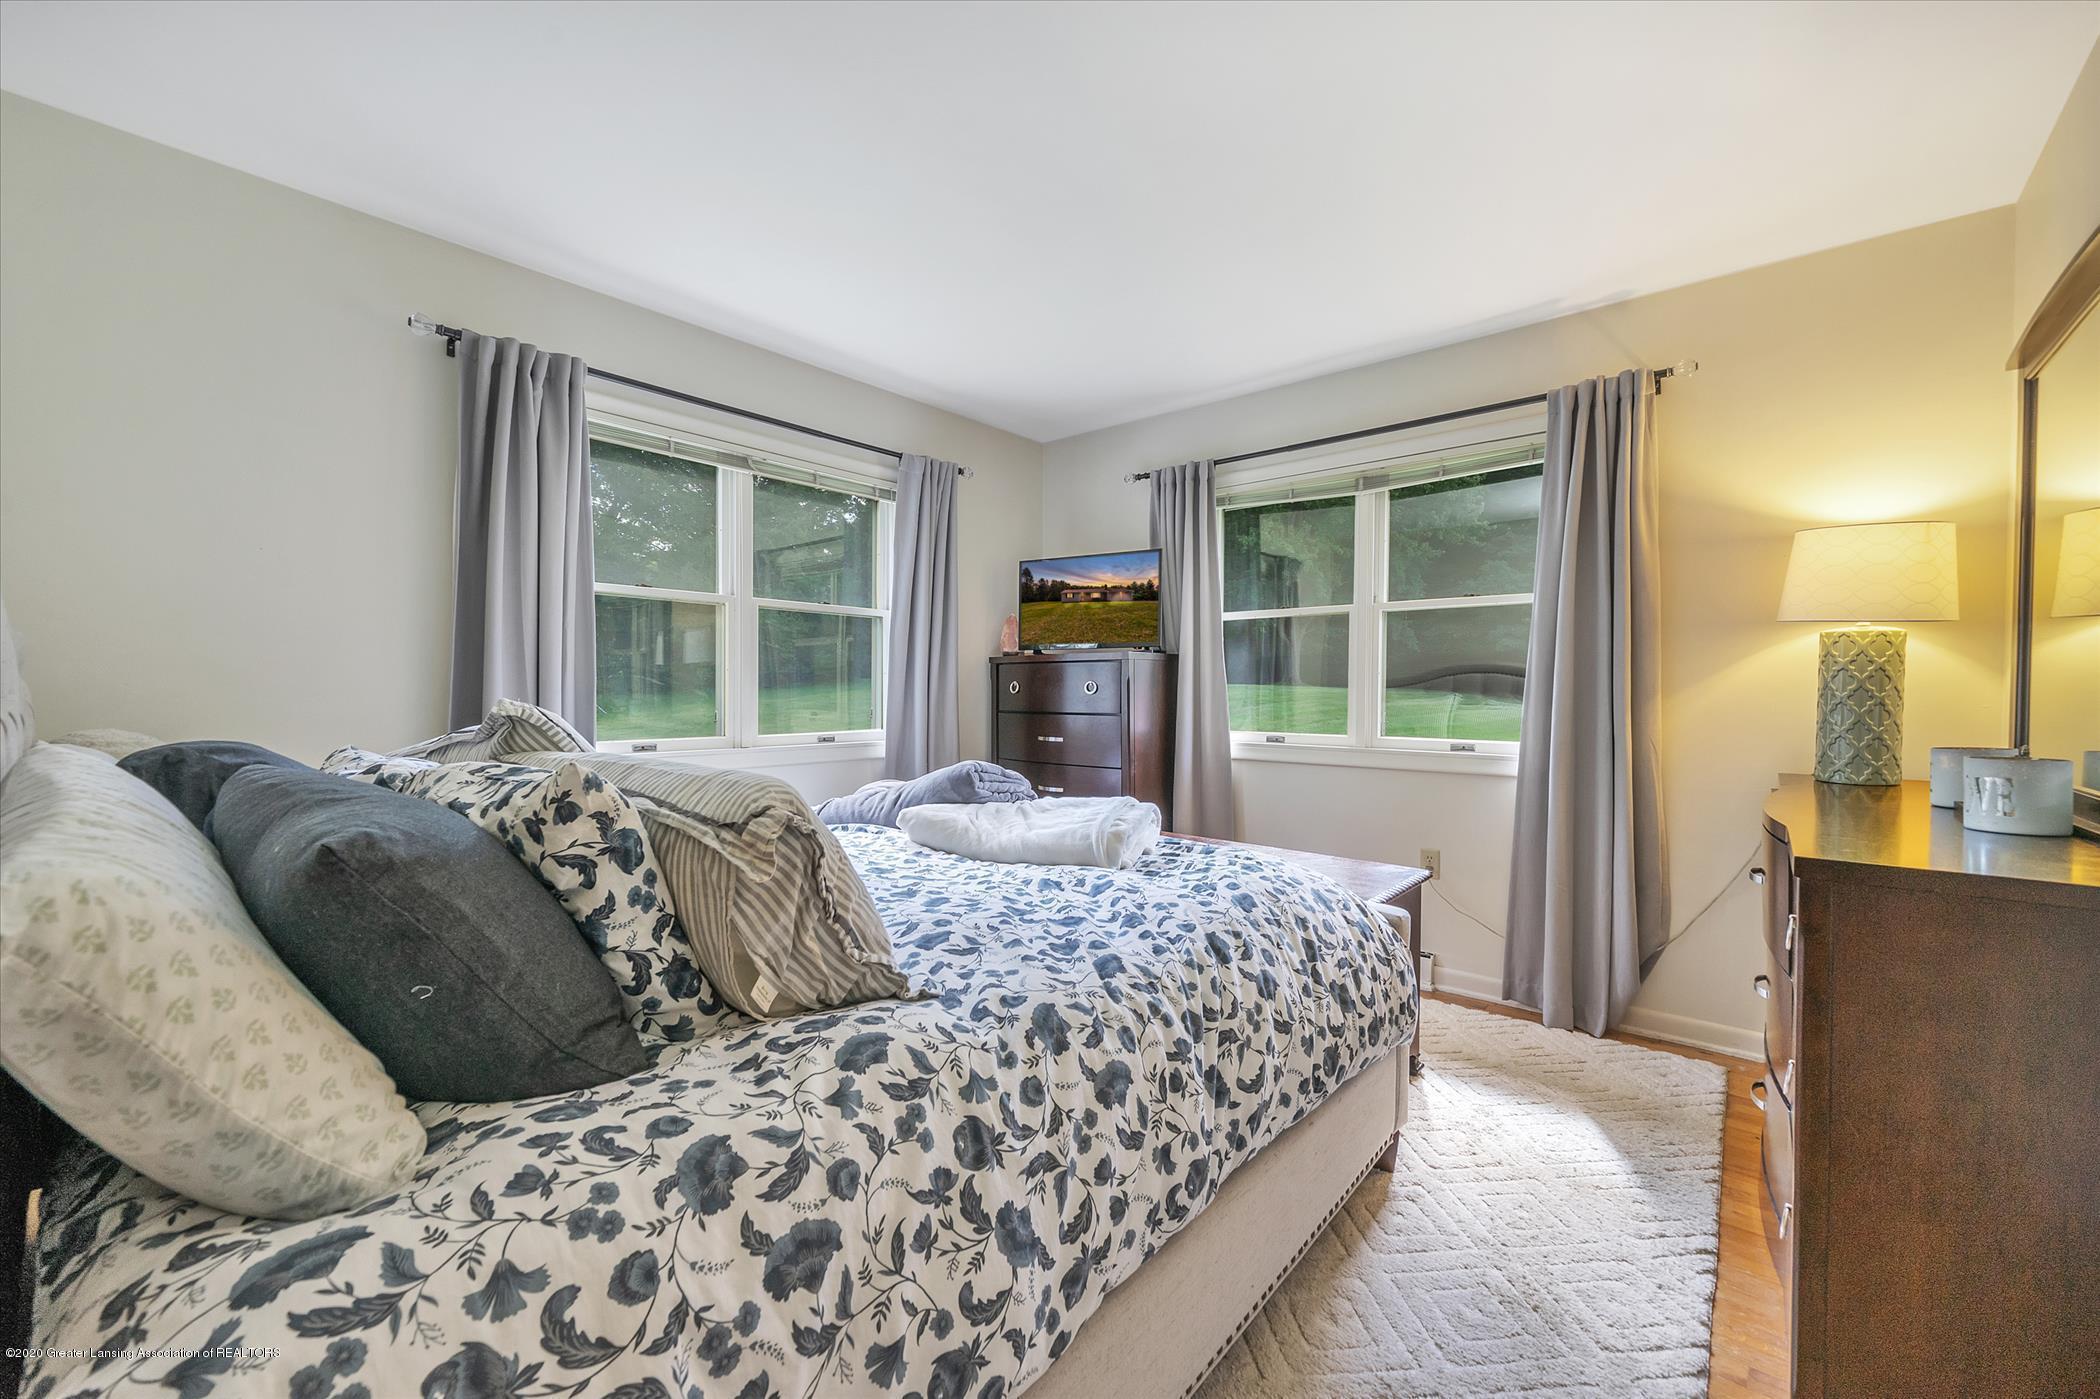 3087 Sandhill Rd - Bedroom 1 - 11